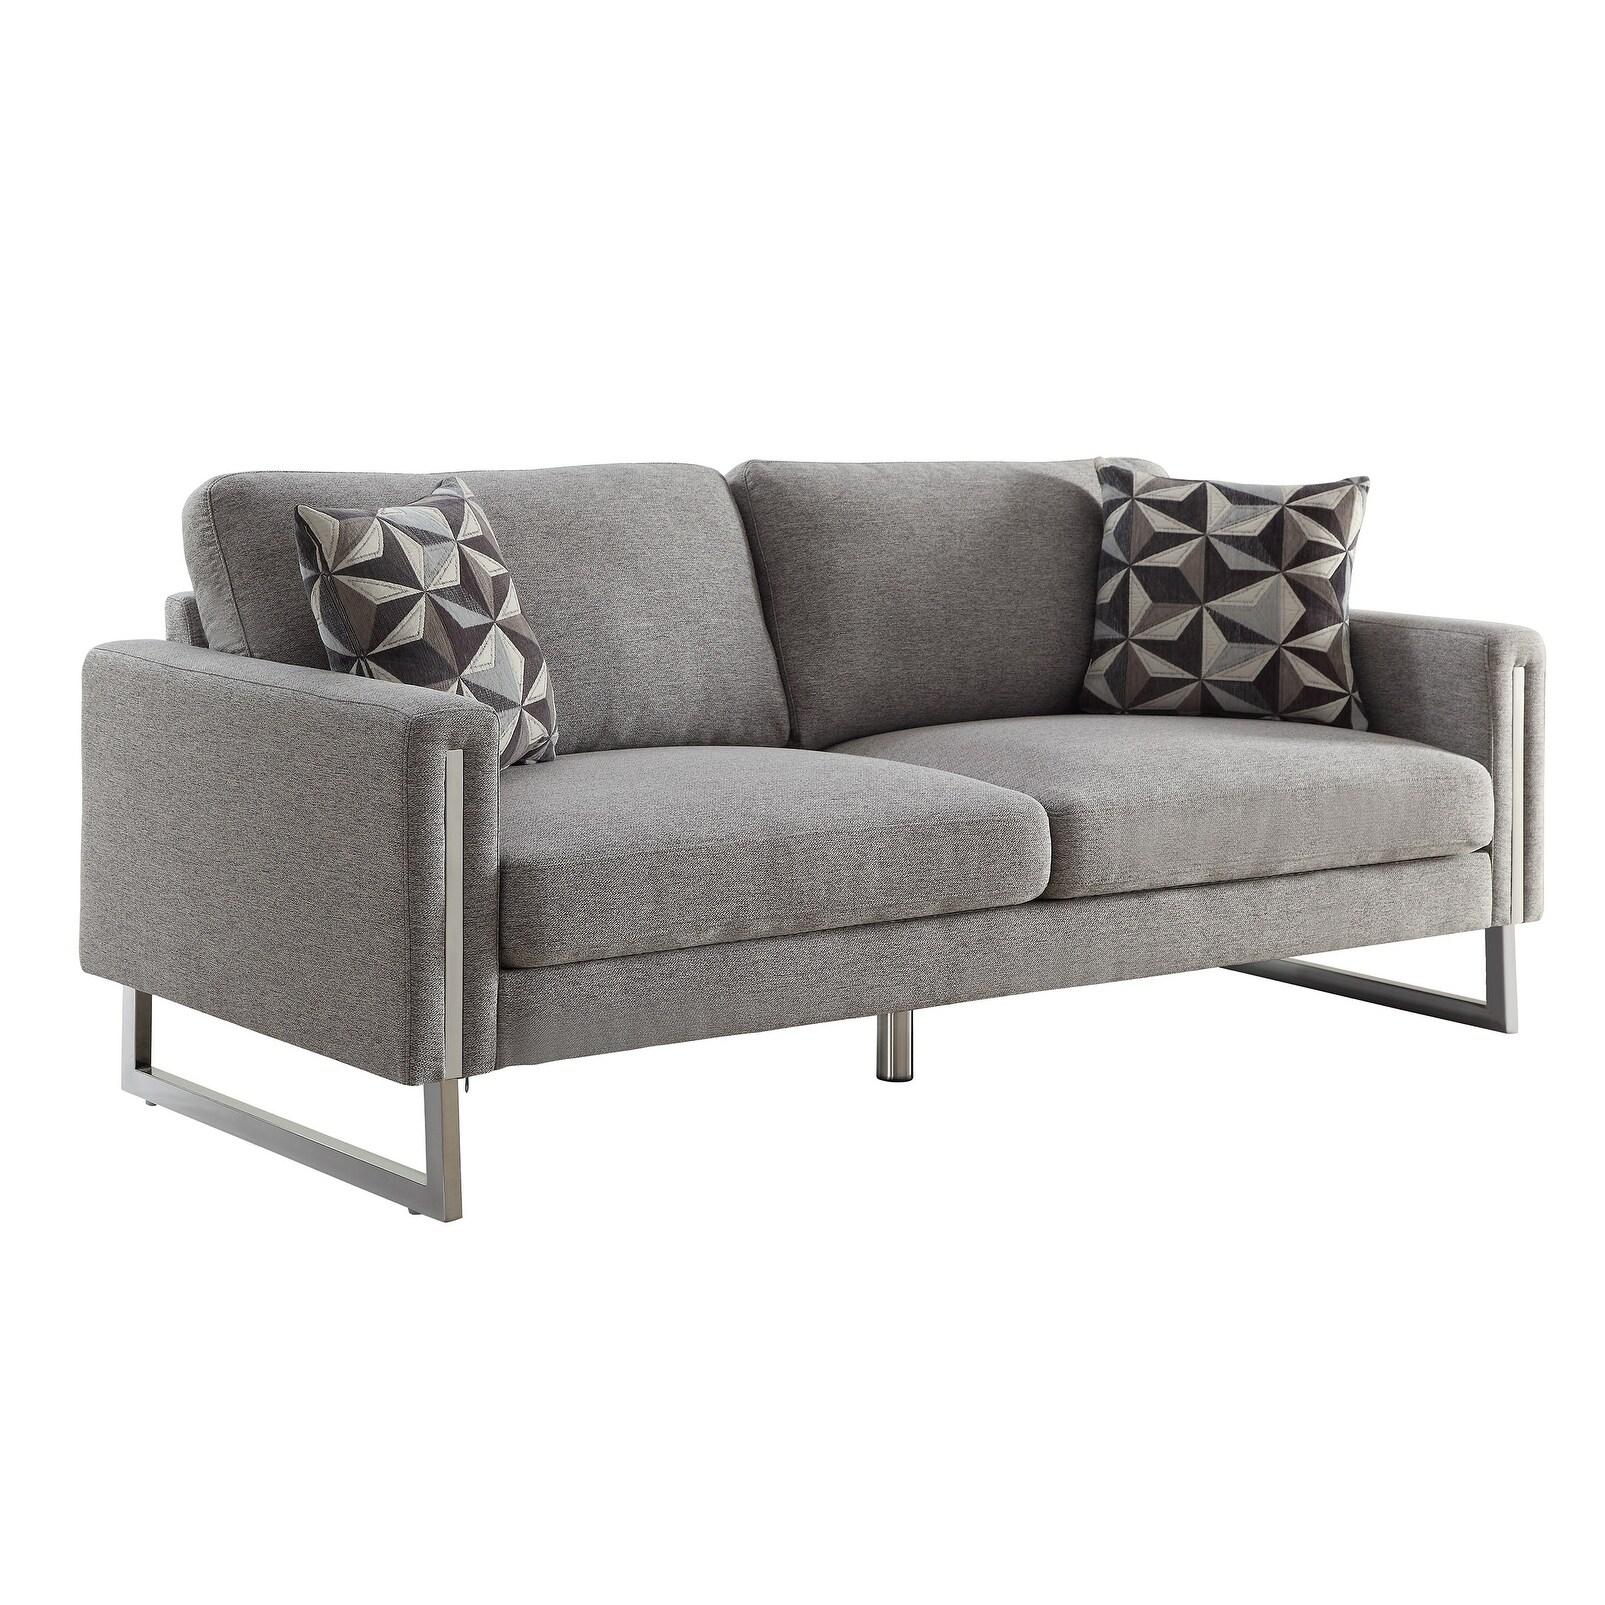 Stylish Grey Modern Sofa with Clovis Contemporary Fabric ...